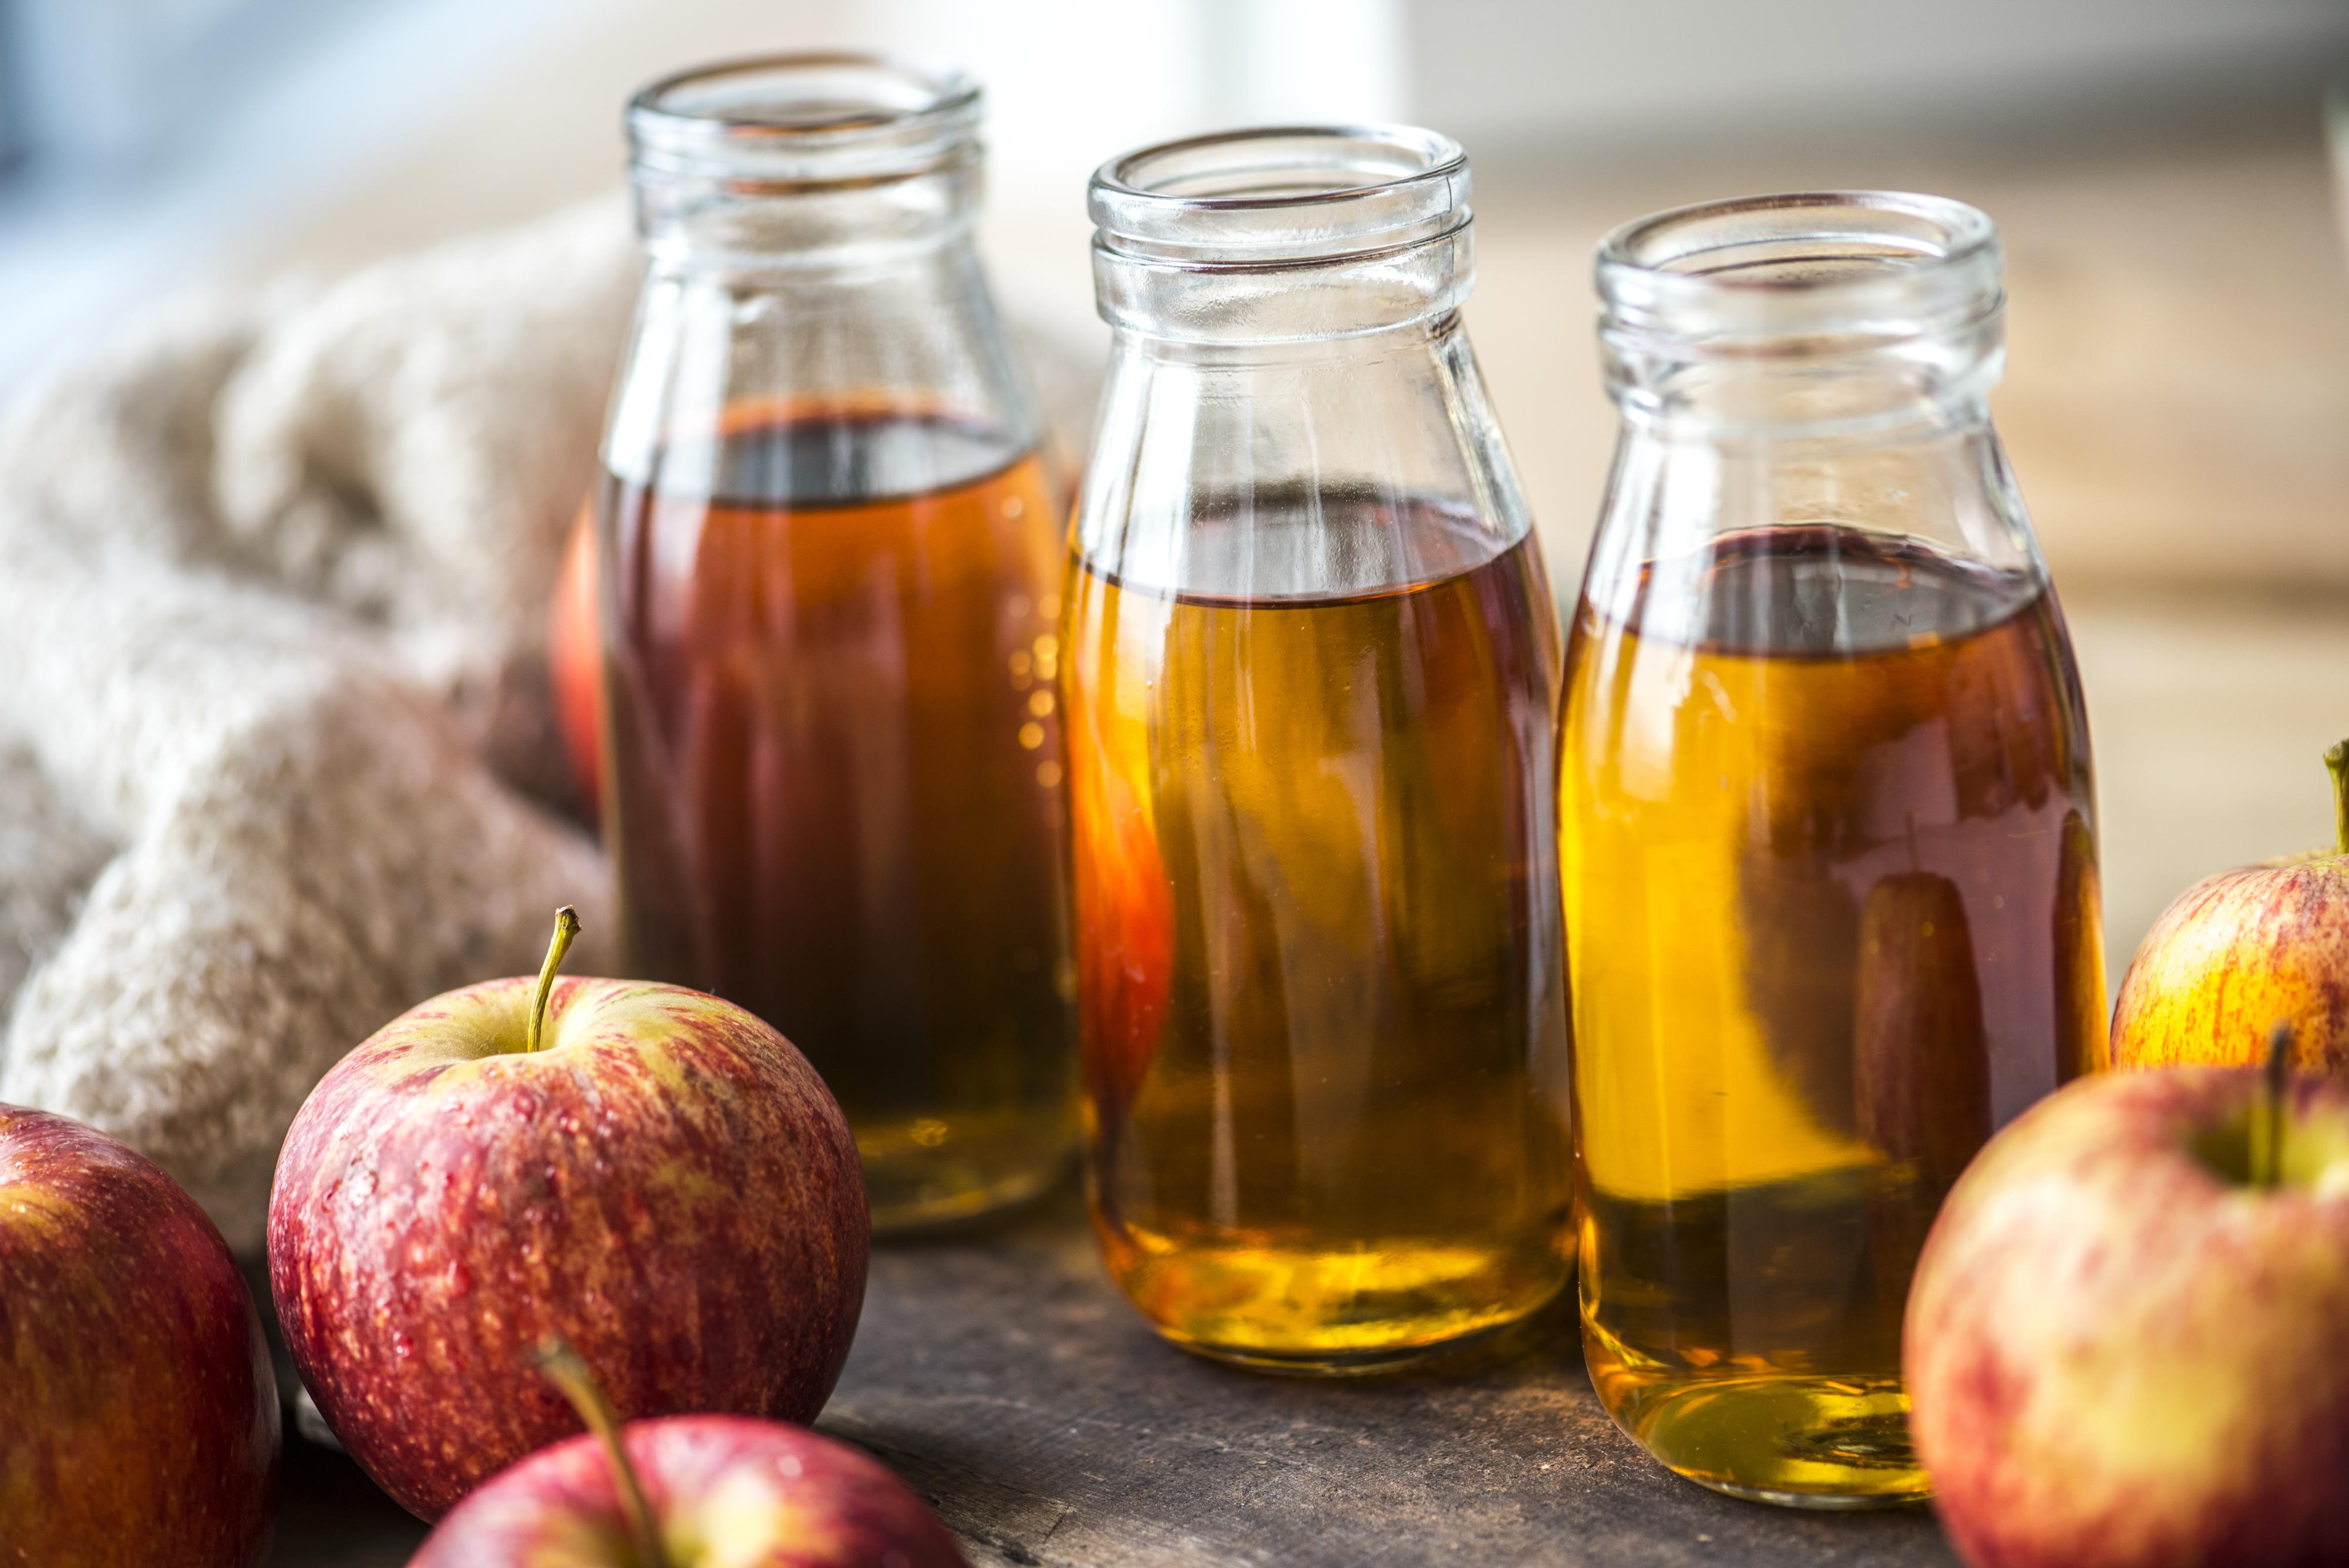 Immagini Belle : Mela, succo di mela, bevanda, Cedro, avvicinamento ...